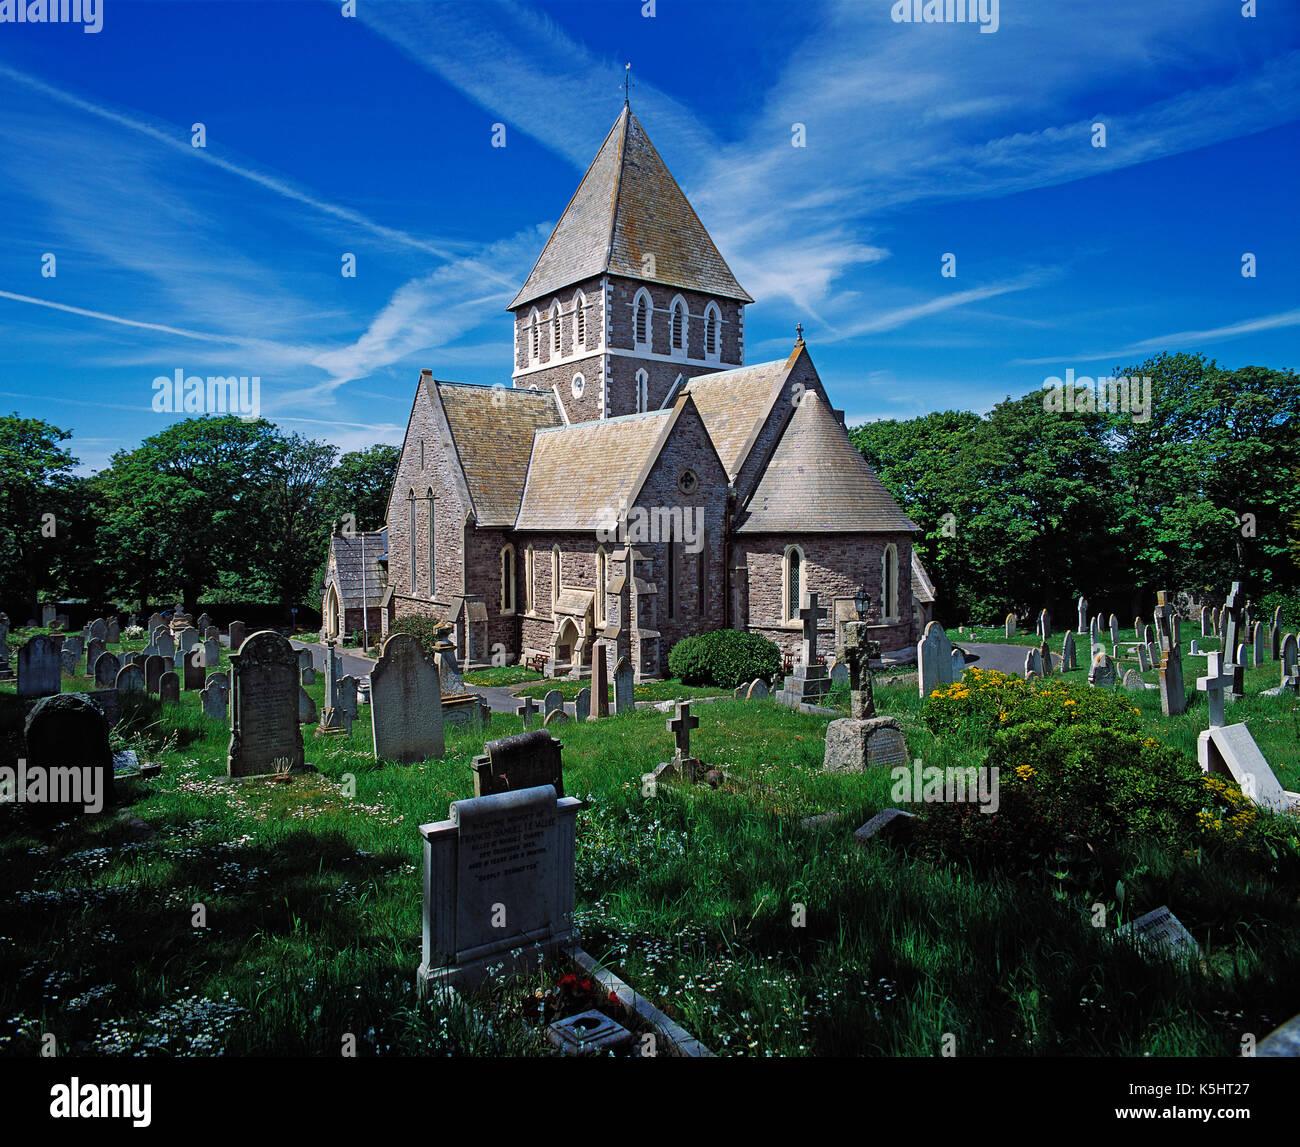 Channel Islands. Alderney. St. Anne's Church. - Stock Image